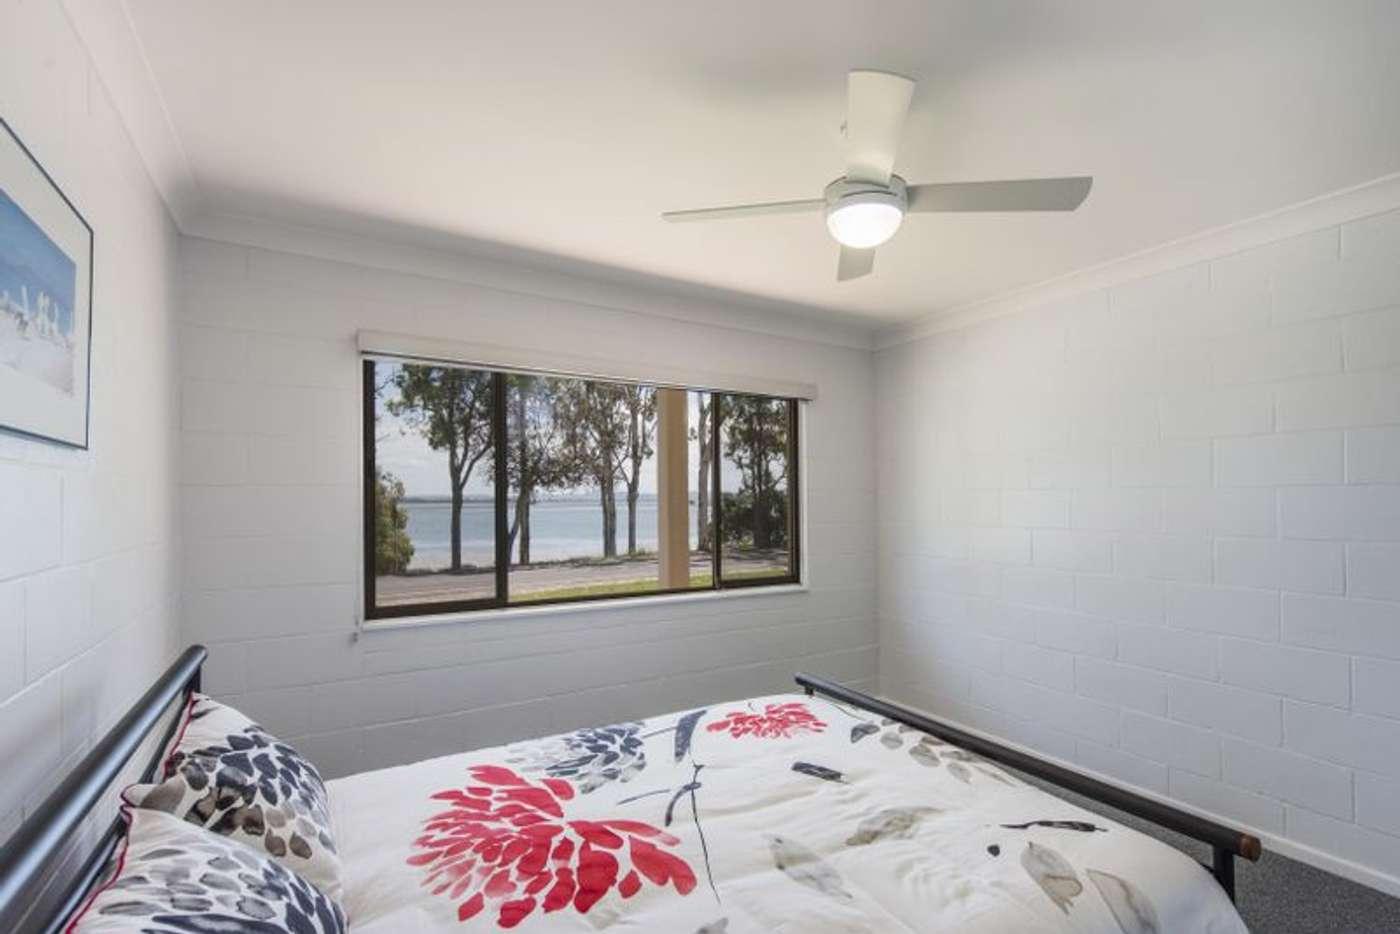 Sixth view of Homely house listing, 3B Duke Street, Iluka NSW 2466